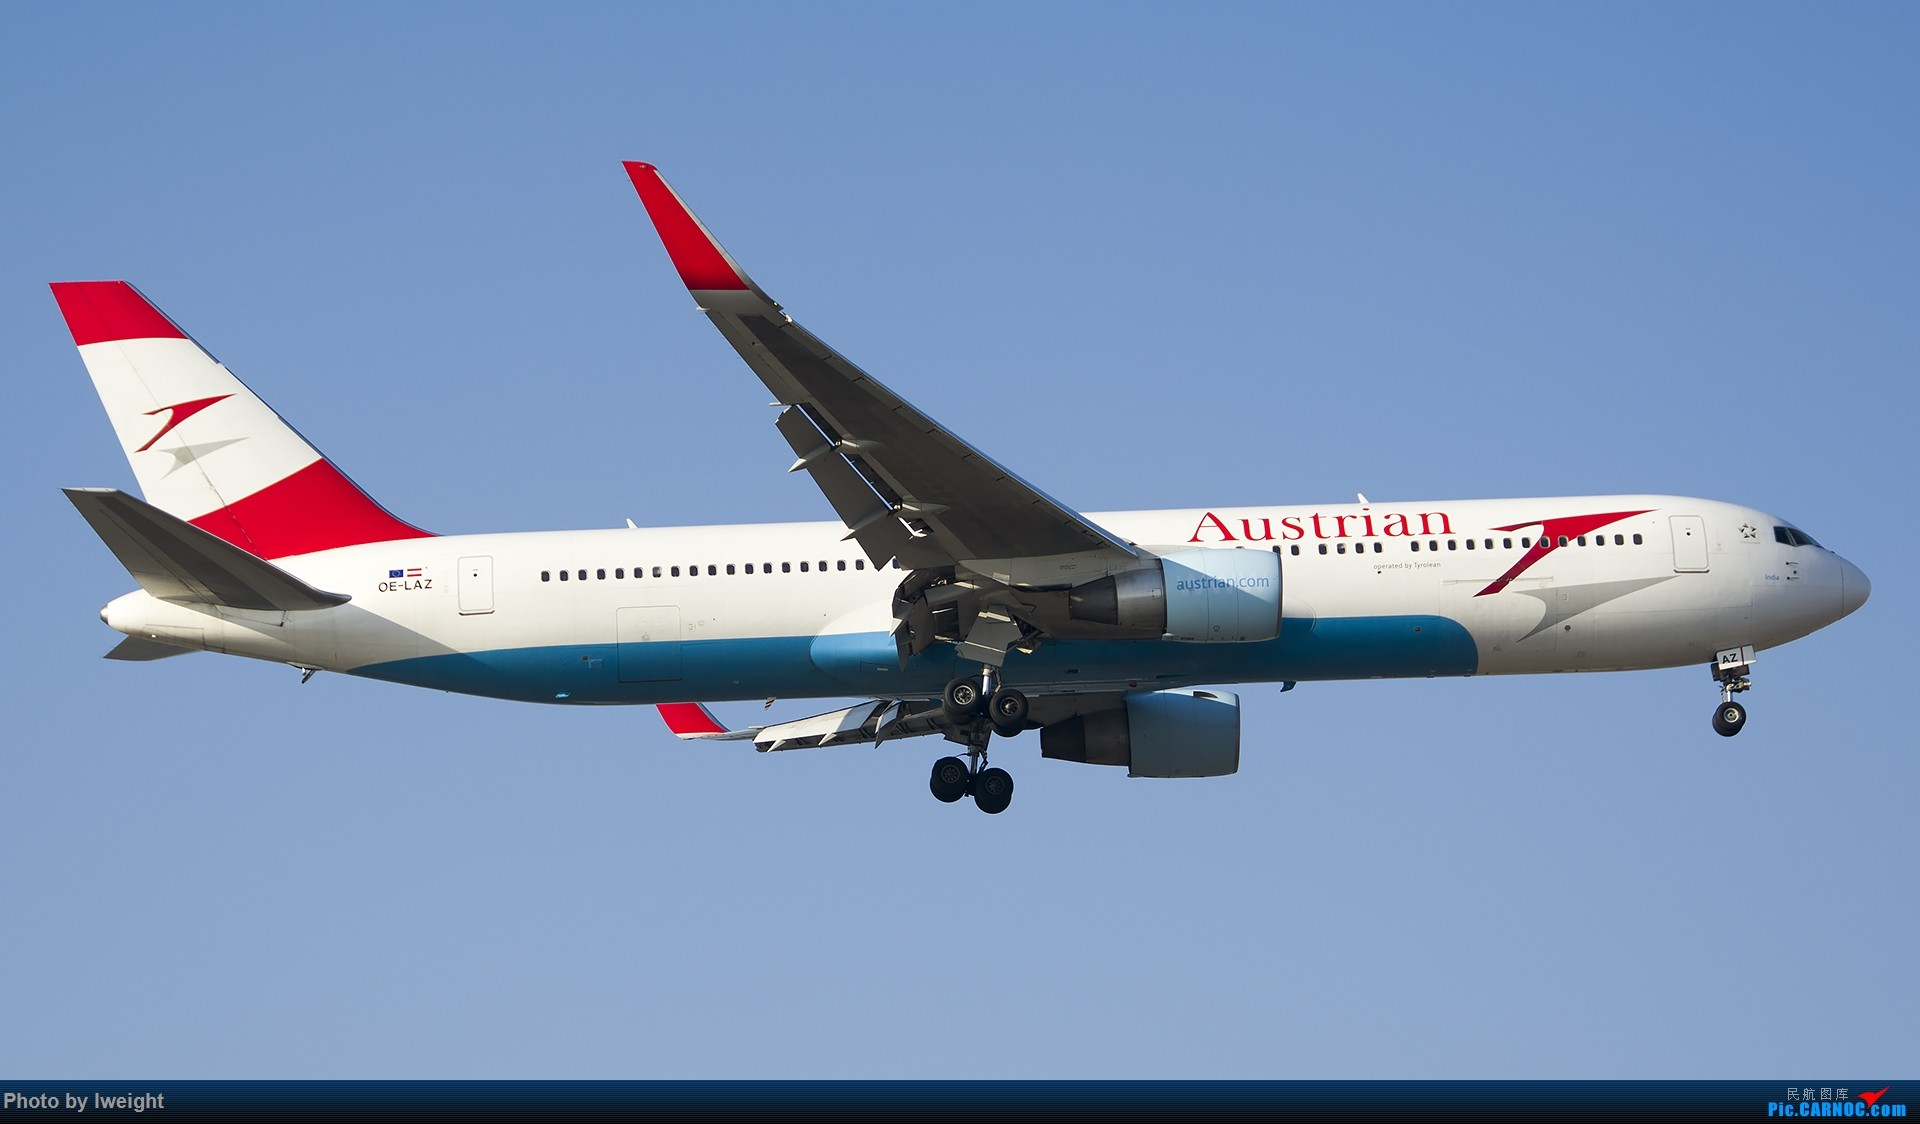 Re:[原创]庆祝升级777,发上今天在首都机场拍的所有飞机【2014-12-14】 BOEING 767-300ER OE-LAZ 中国北京首都国际机场